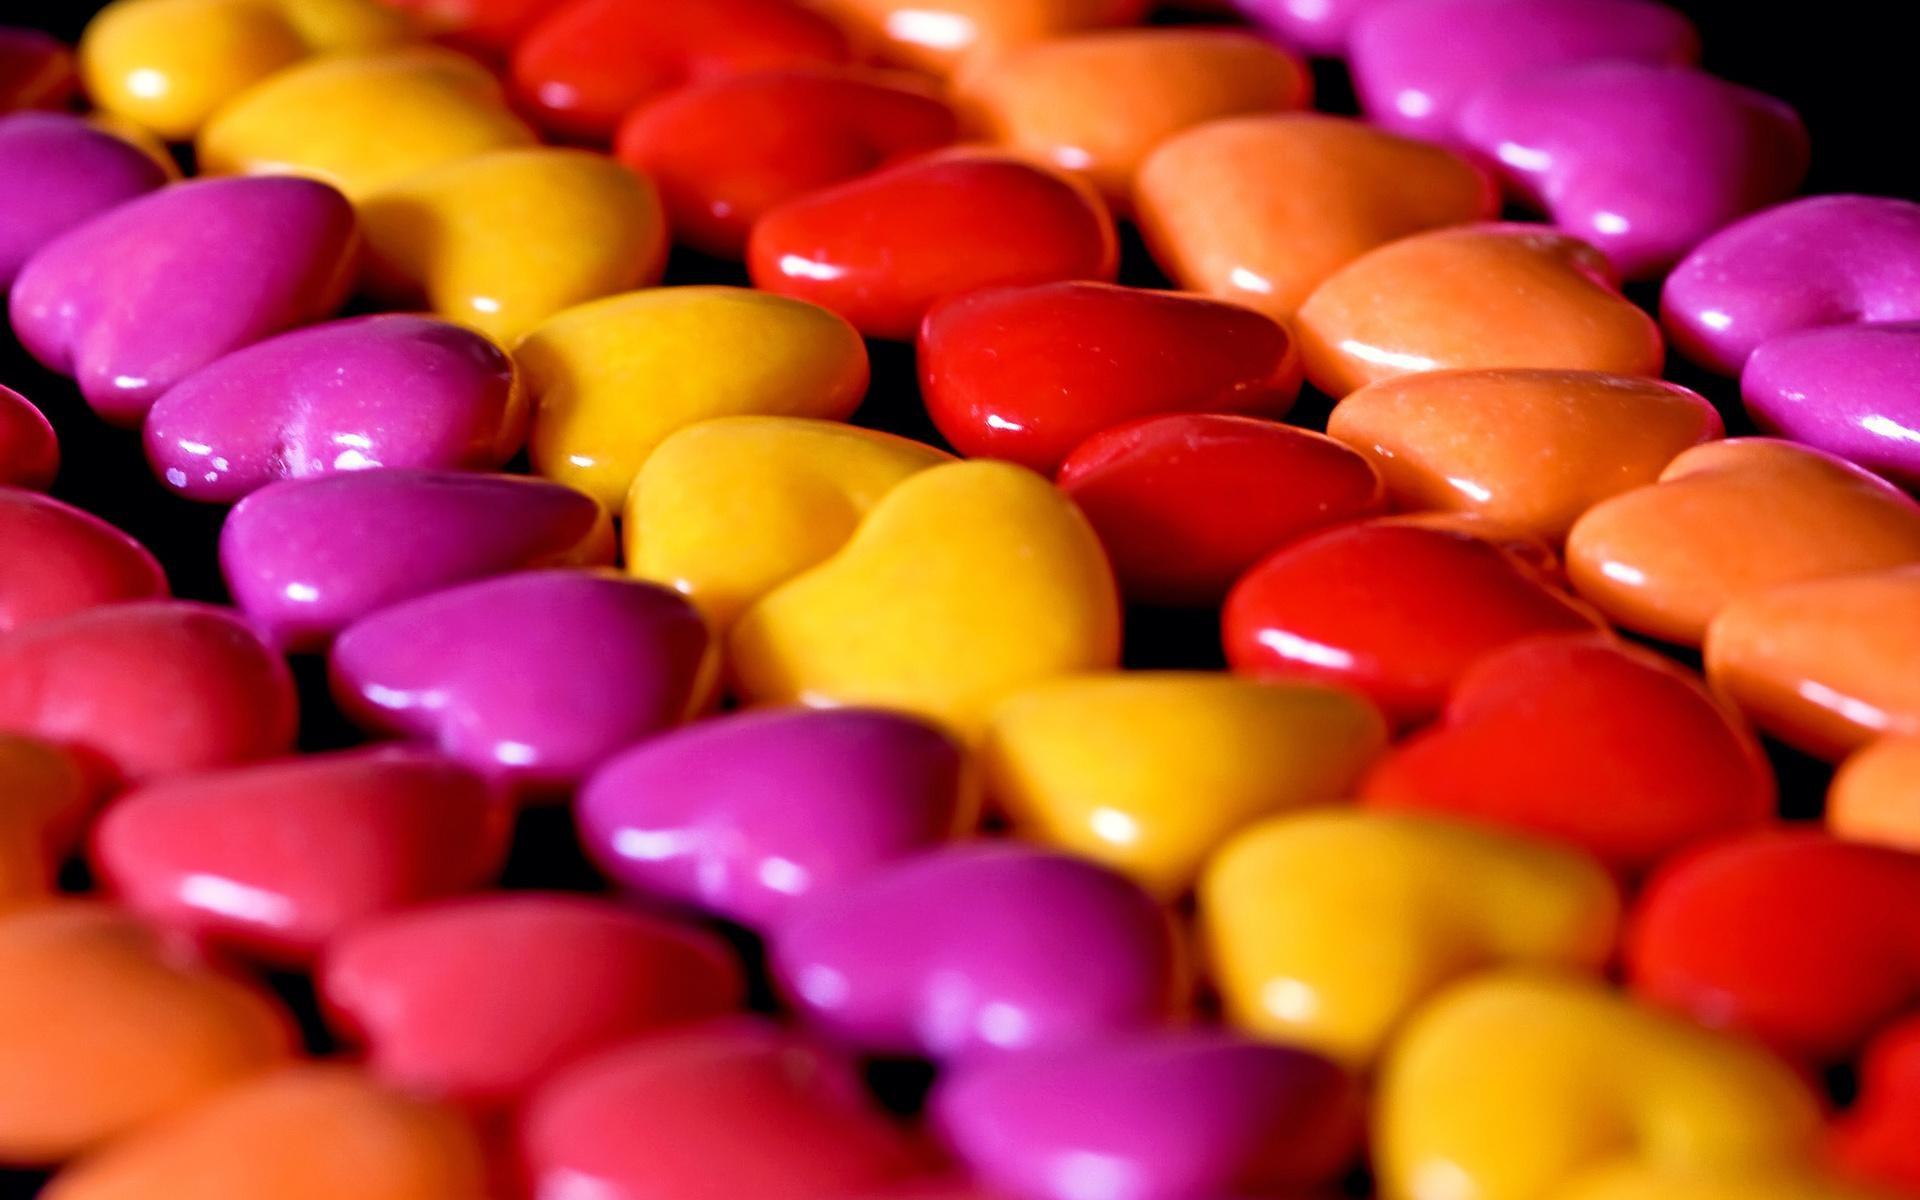 Candy HD